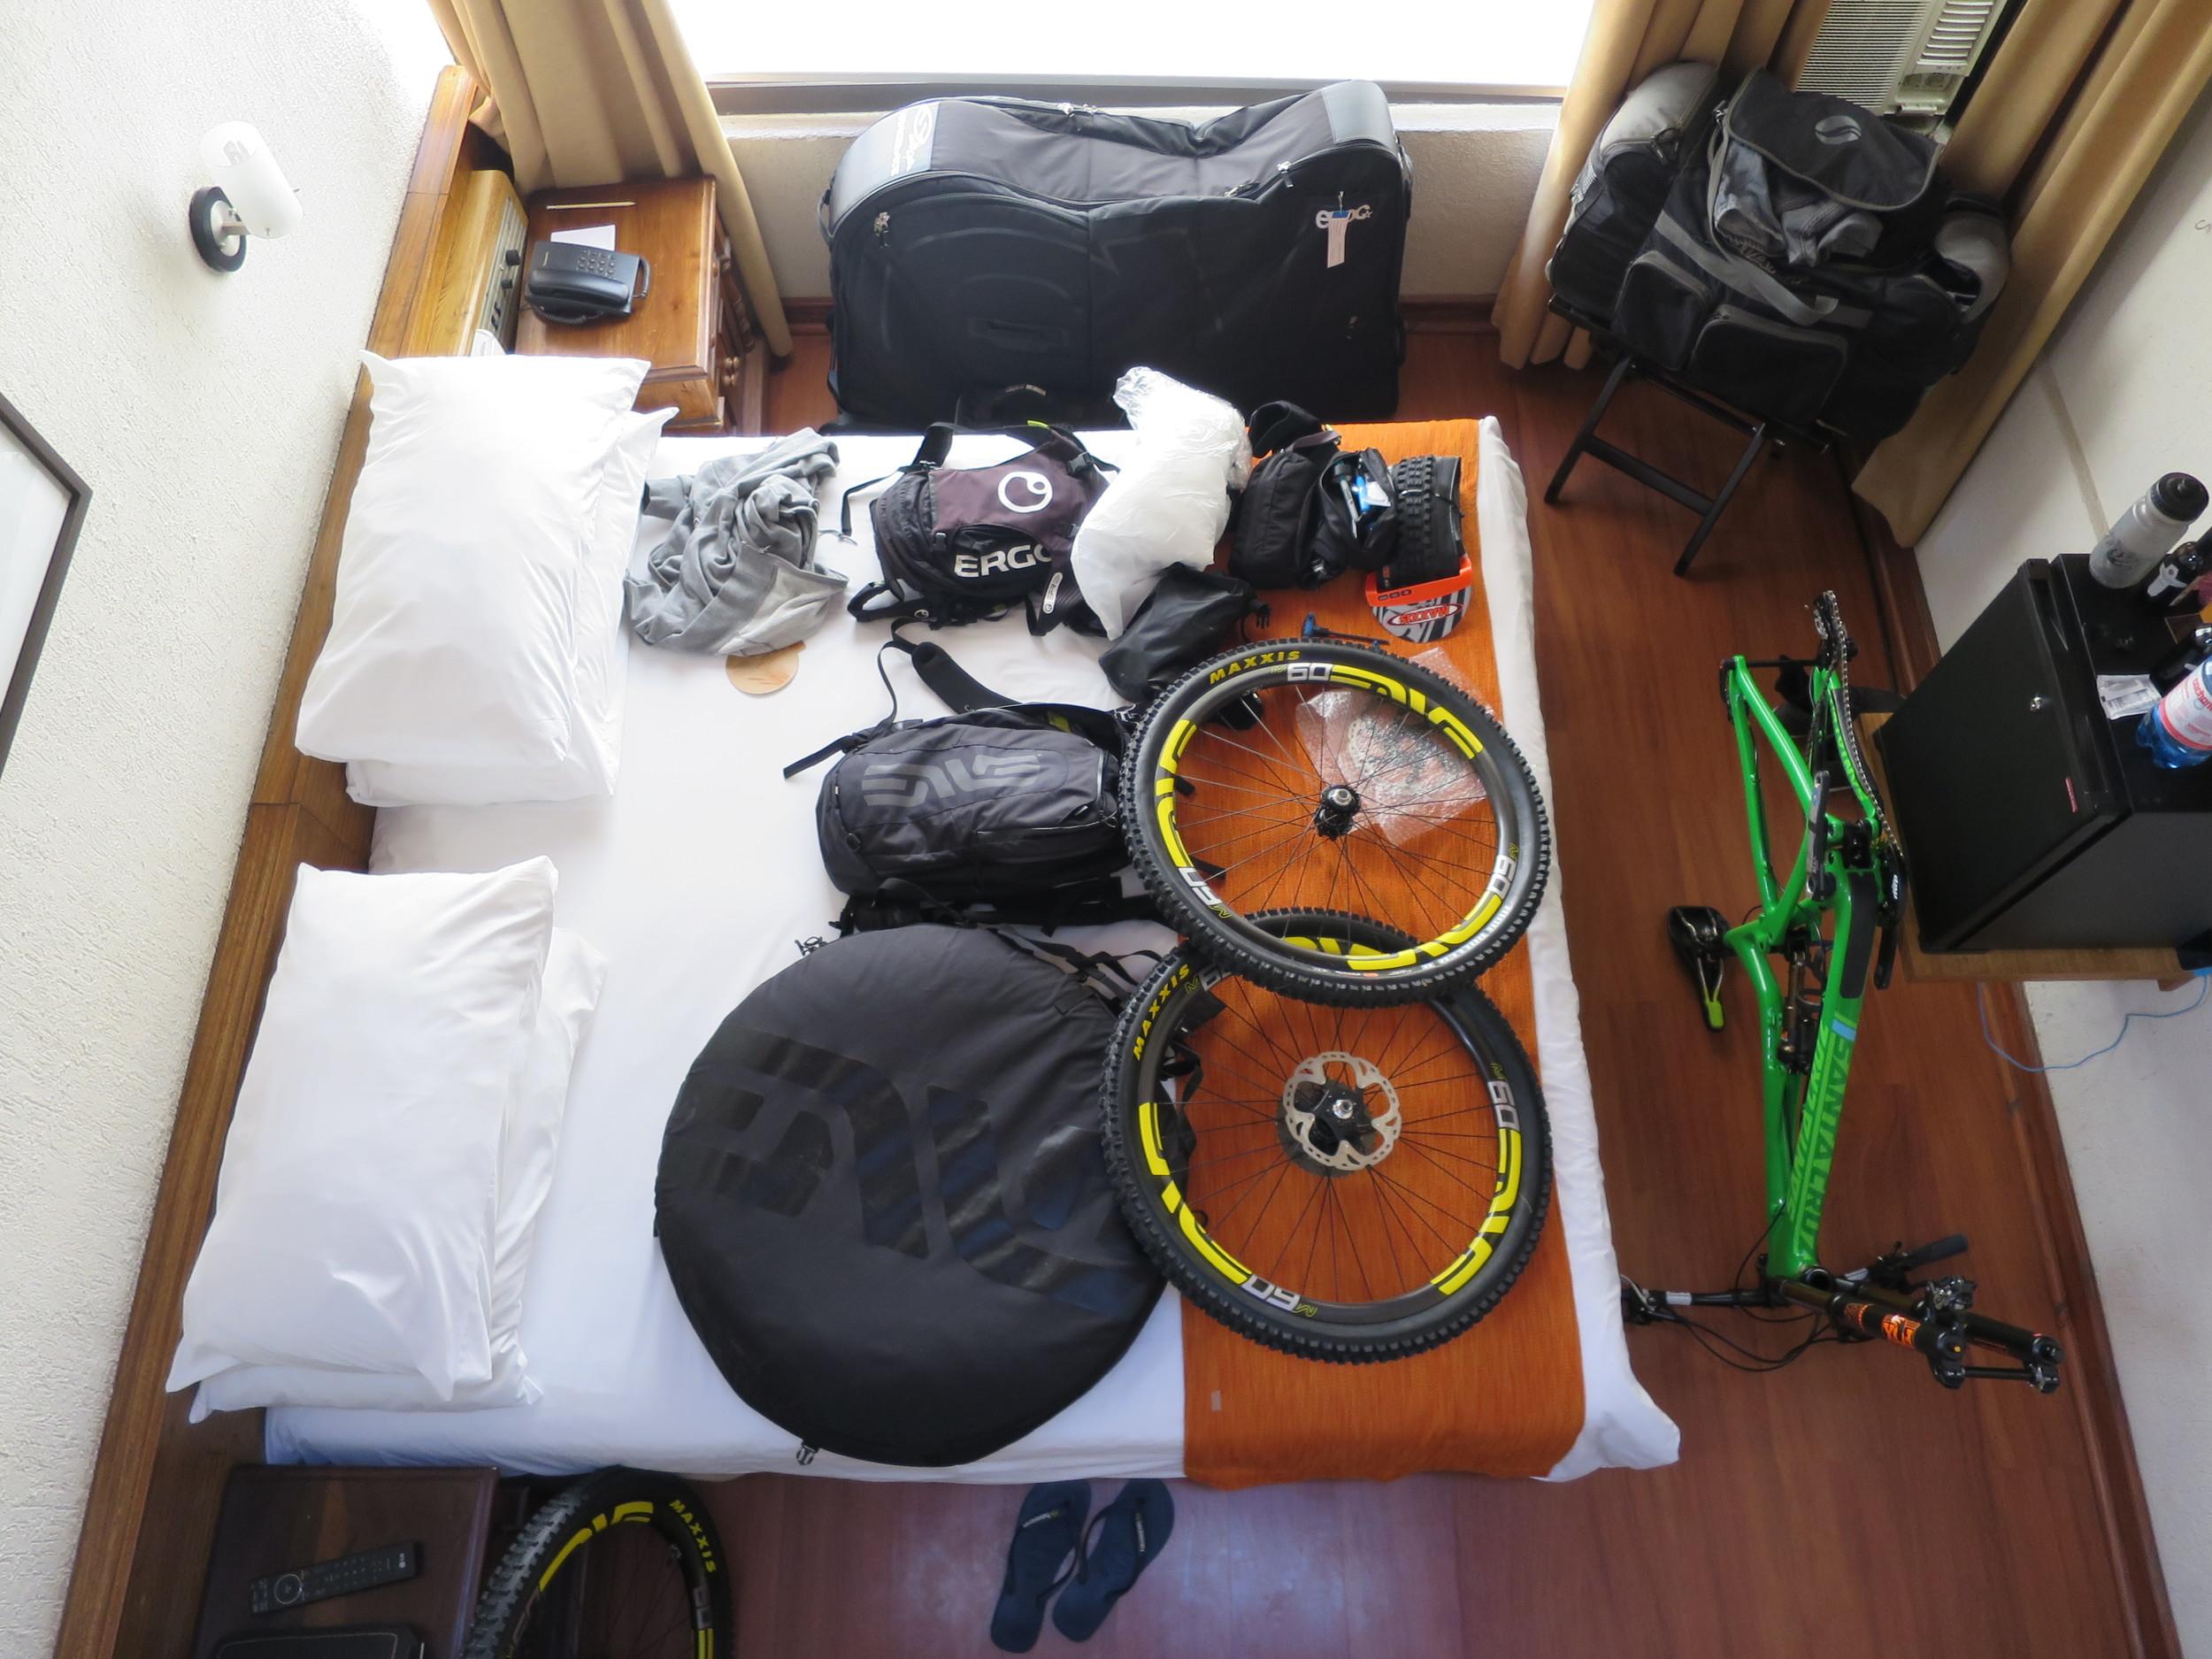 1 Unpacking